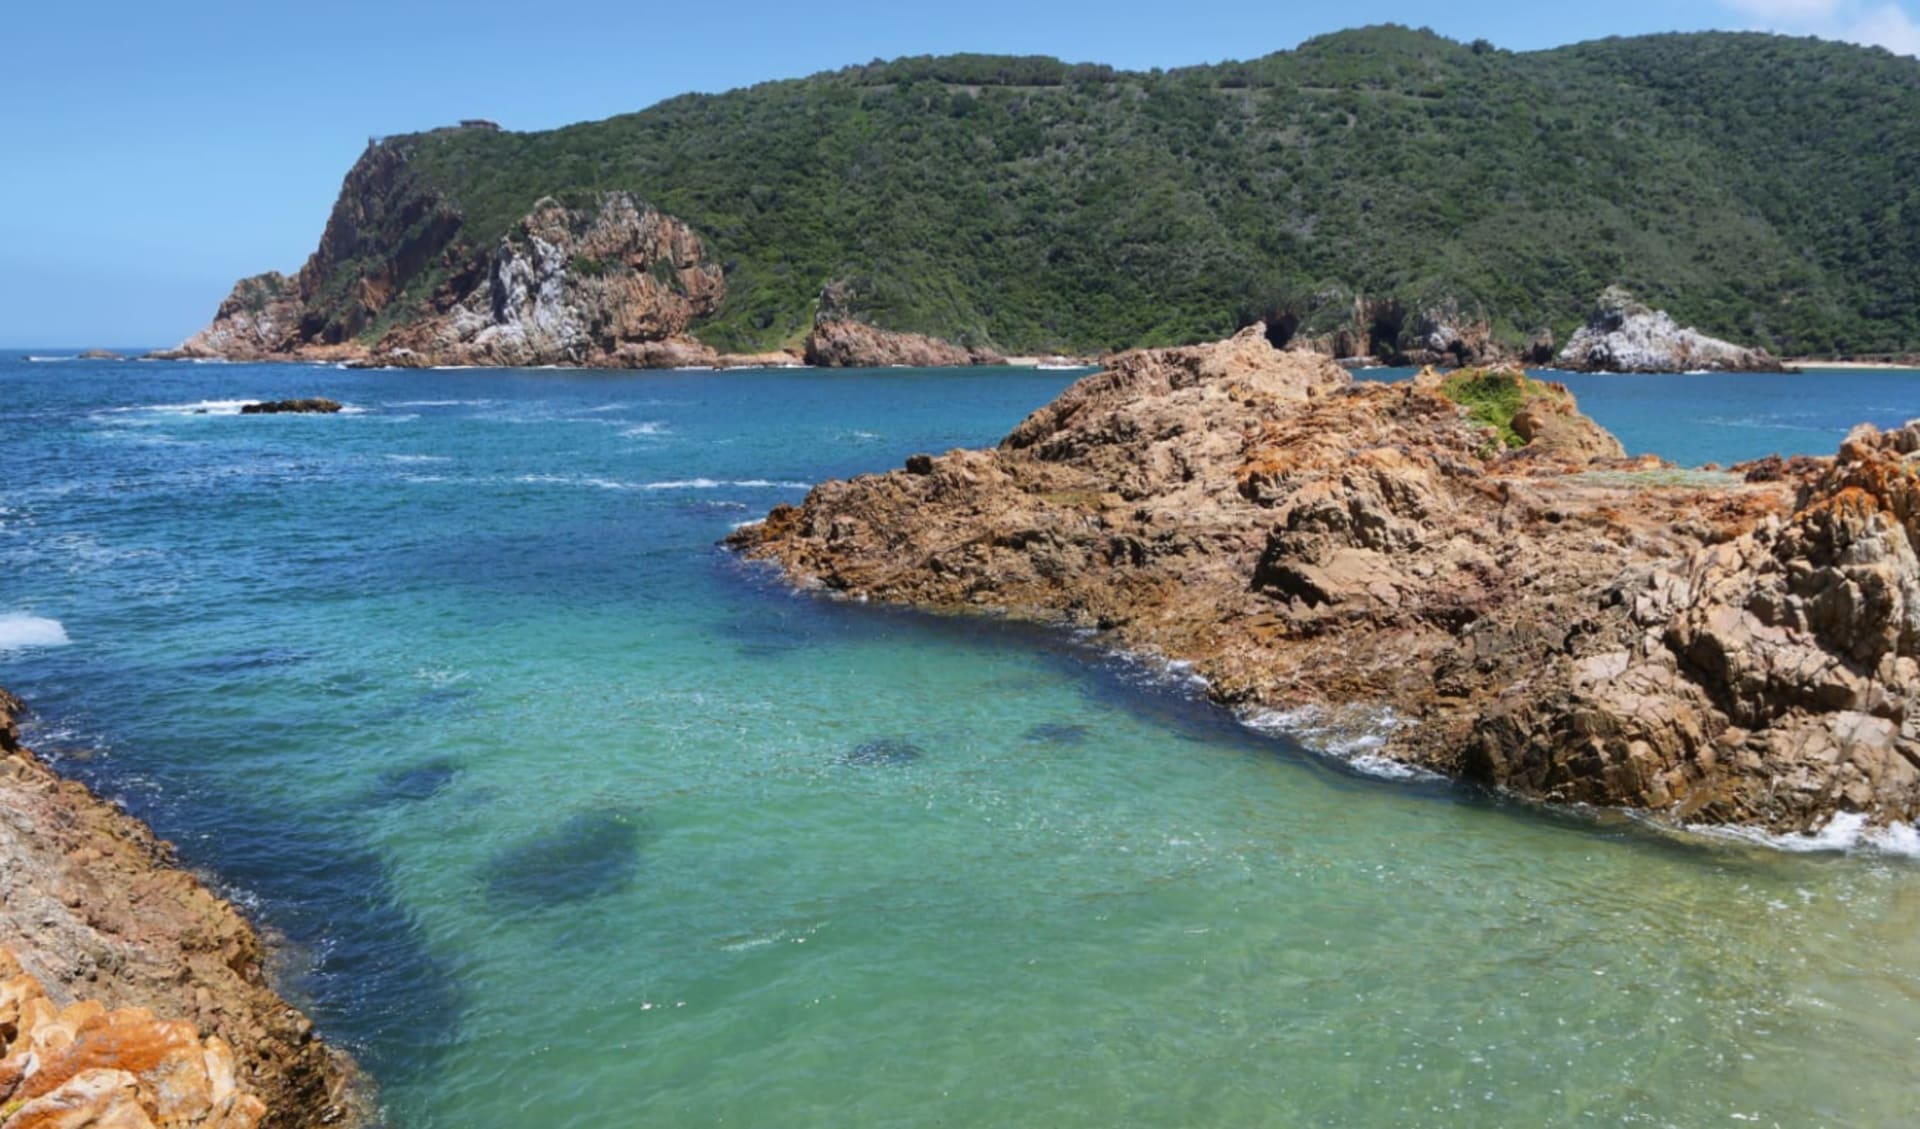 Südafrika Klassiker Gruppenreise ab Johannesburg: Südafrika - Garden Route - Knysna Lagune